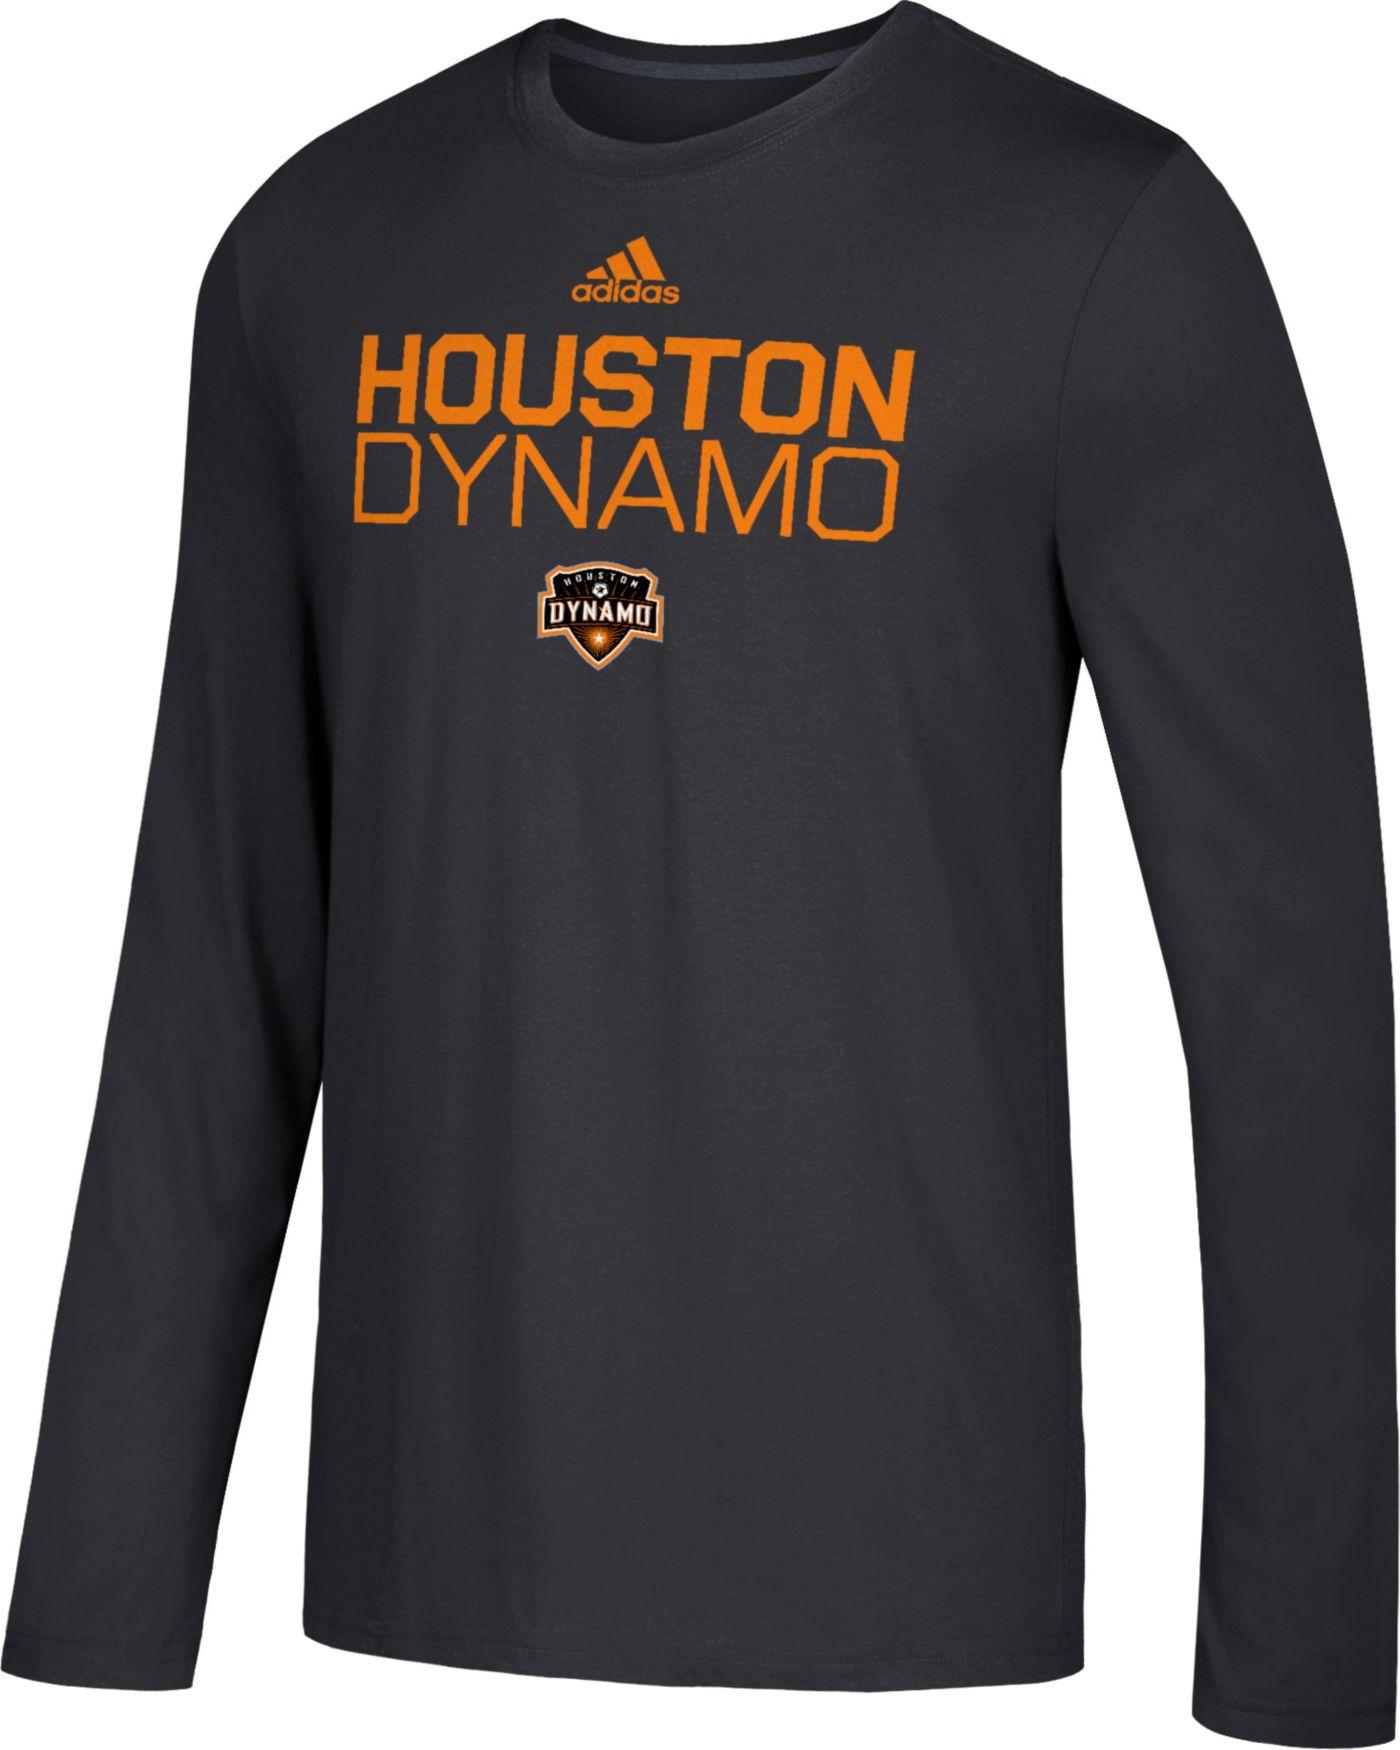 adidas Men's Houston Dynamo Logo Performance Black Long Sleeve Shirt